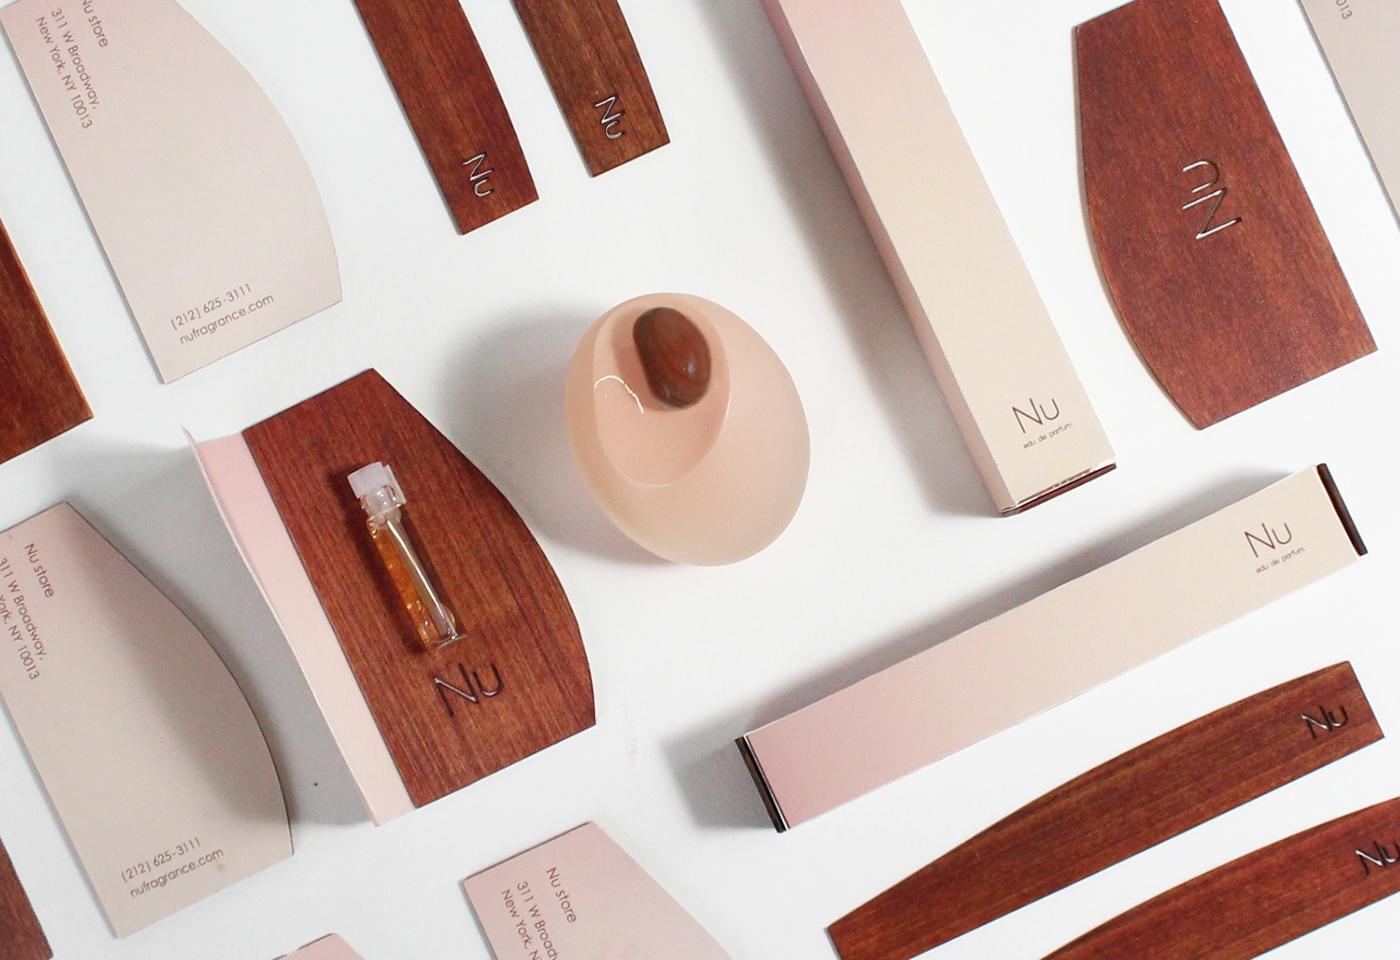 branding  cosmetics Fragrance pafume package design Packaging graphic nu nude